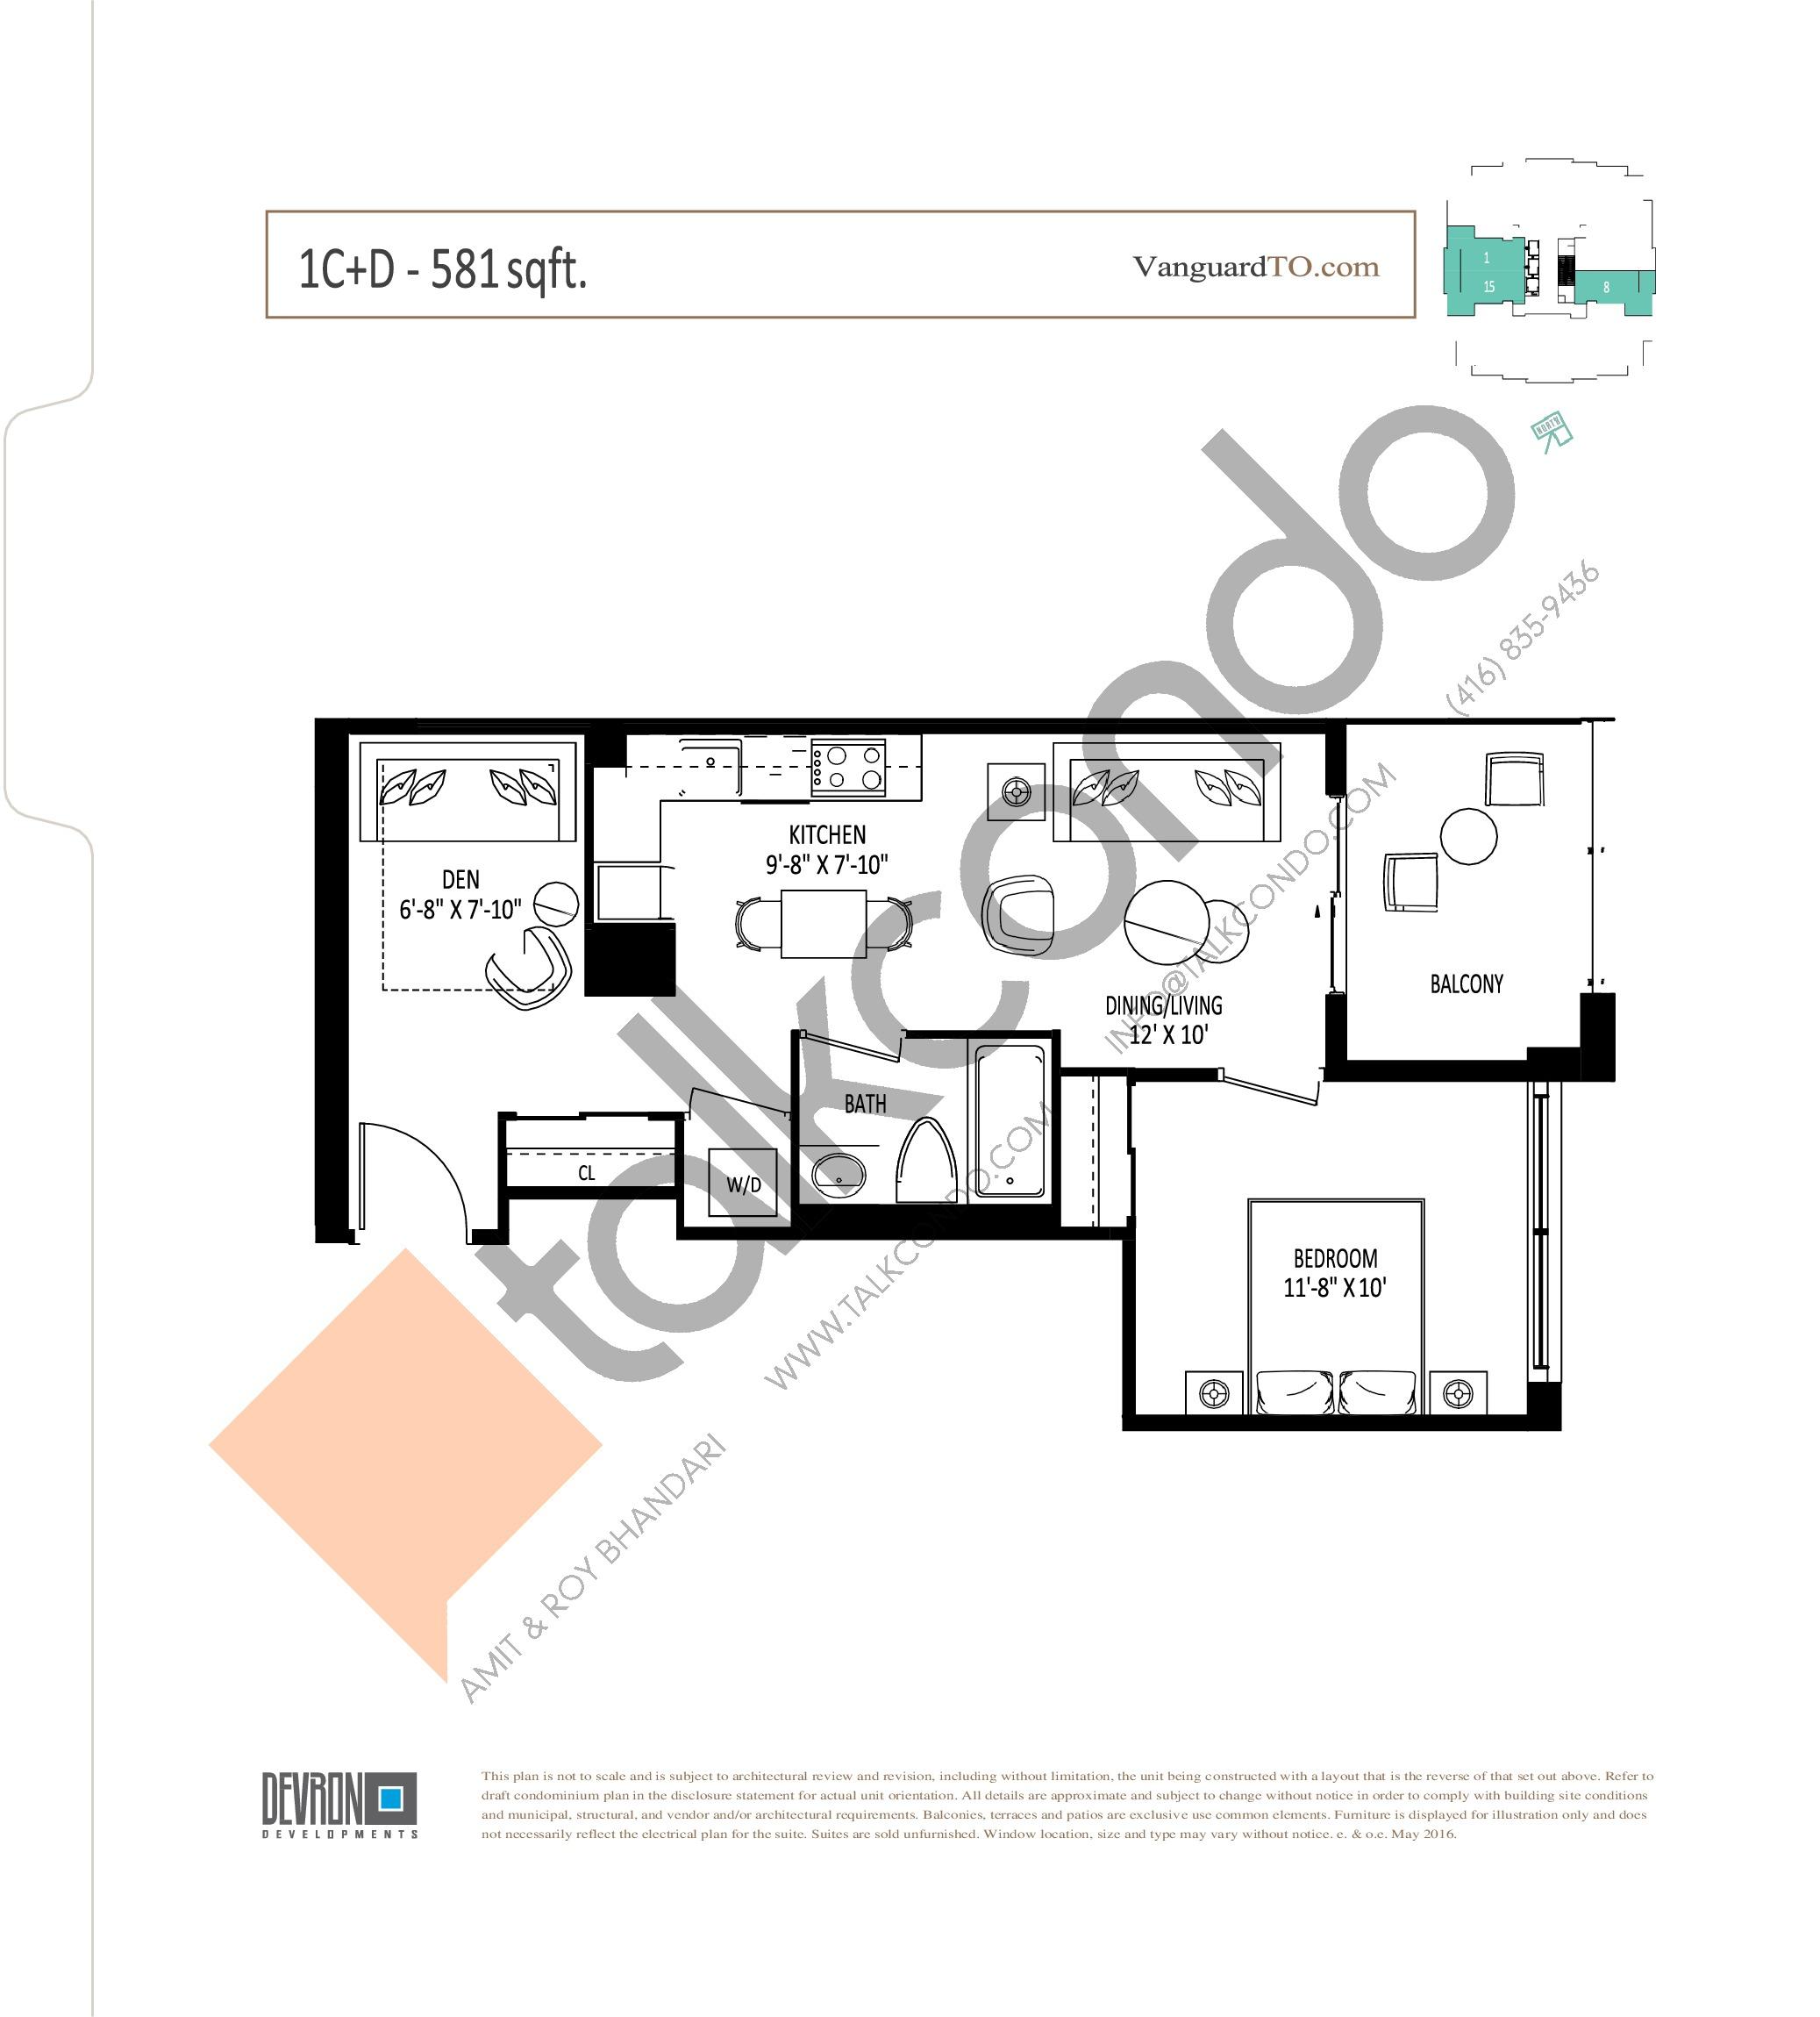 1C+D Floor Plan at The Vanguard - 581 sq.ft